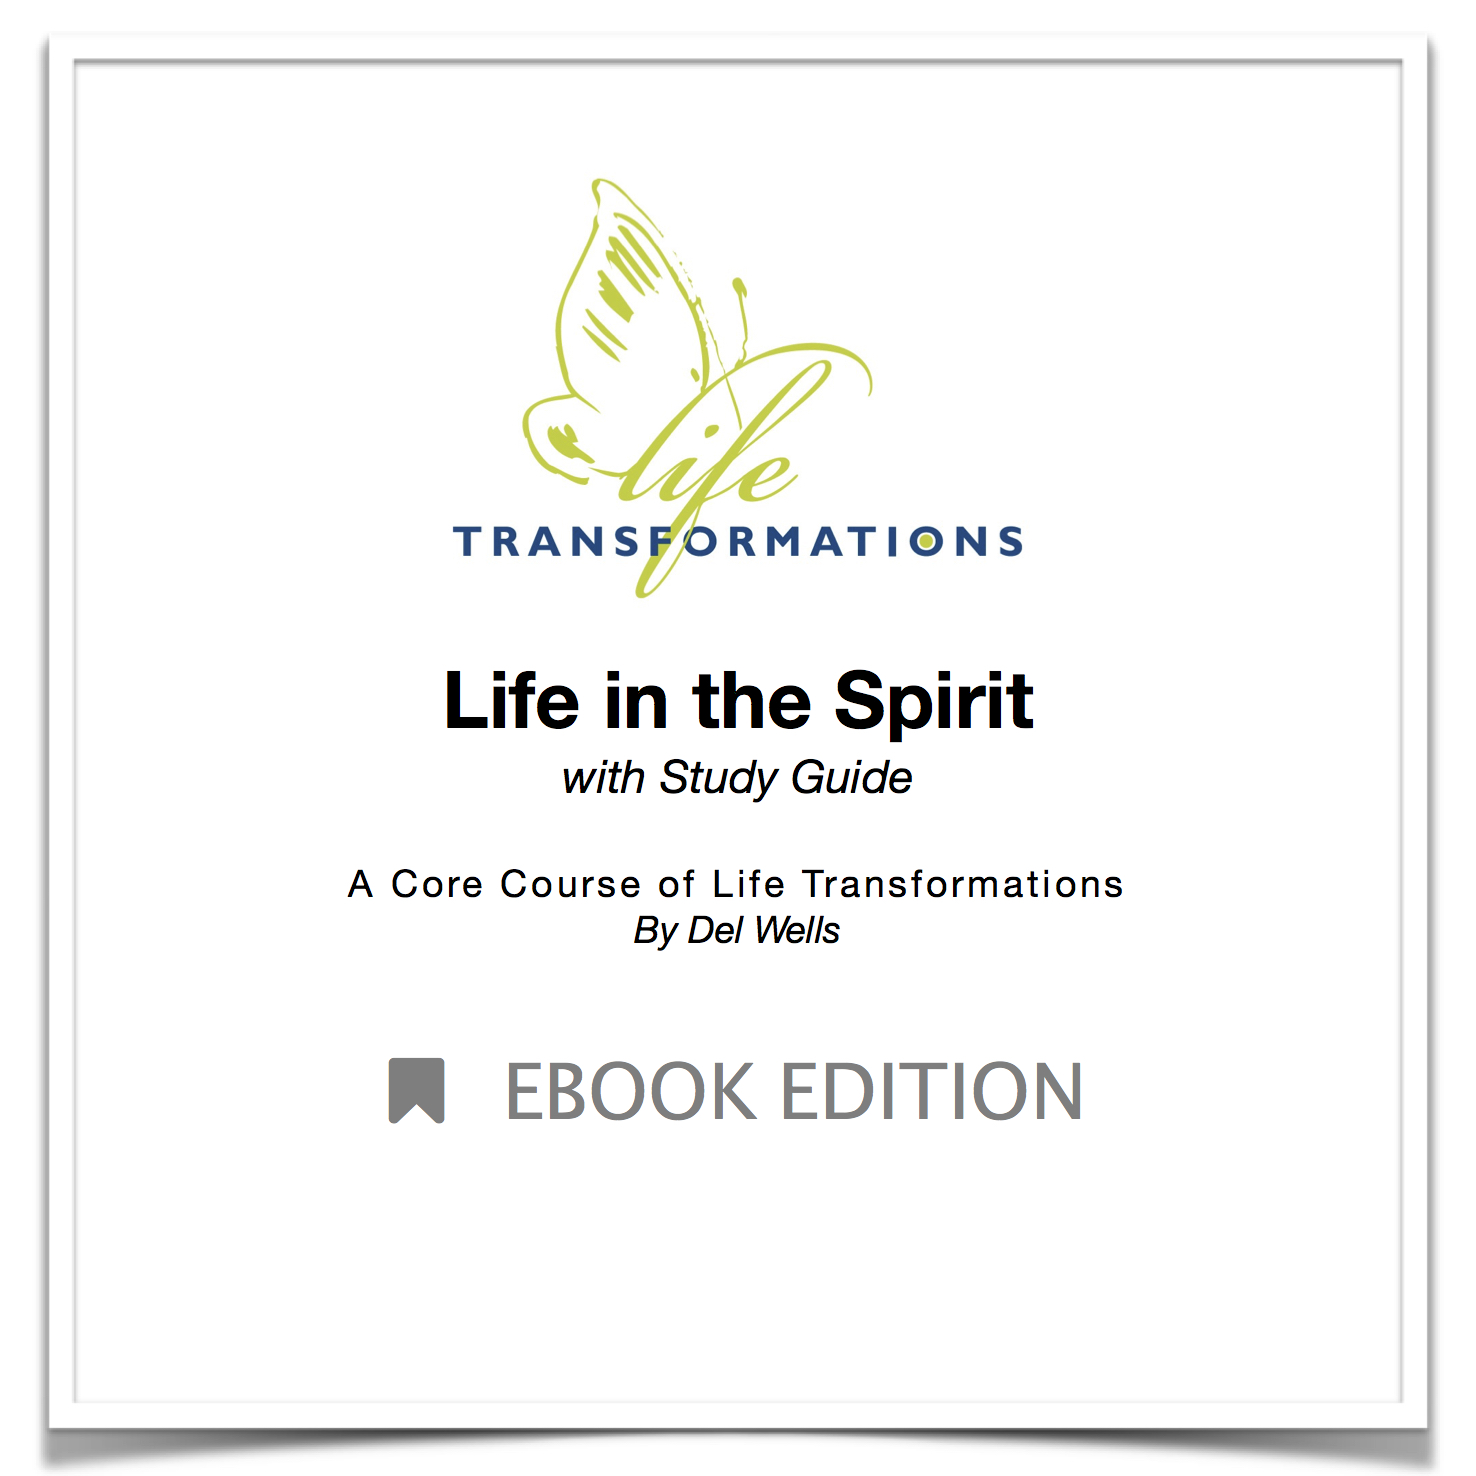 Life in the Spirit - Cover.jpg